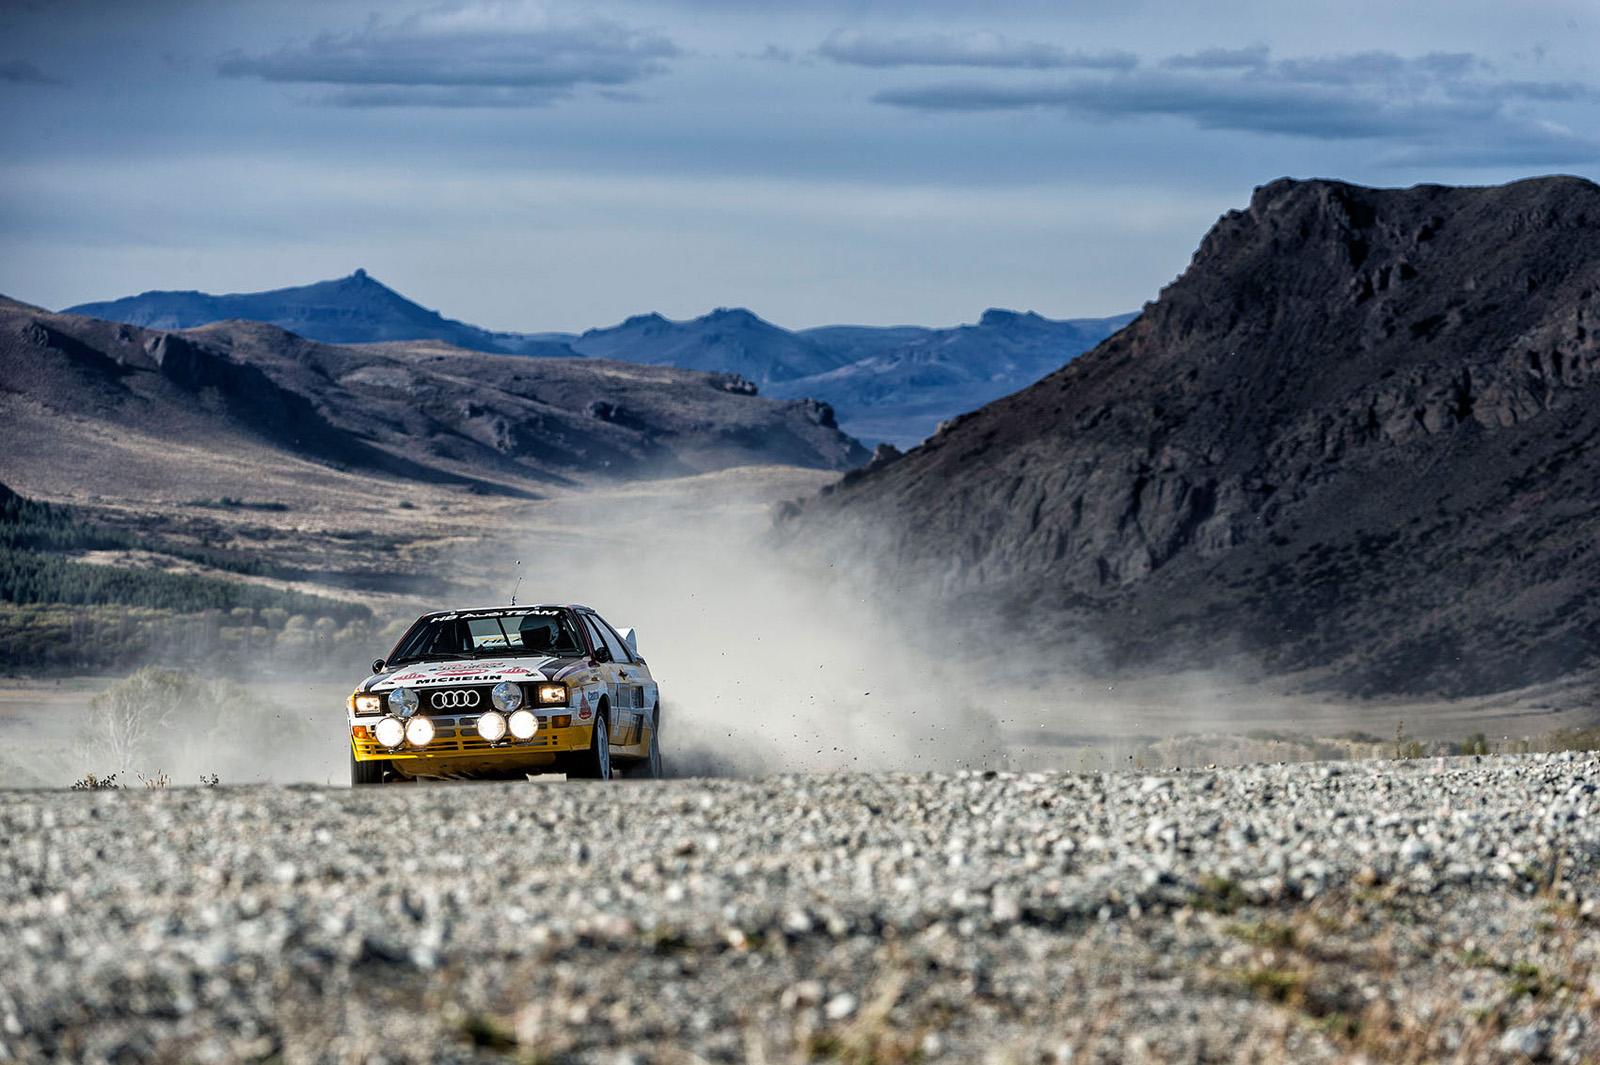 607_Audi_Rallyquattro_Arg_019.jpg